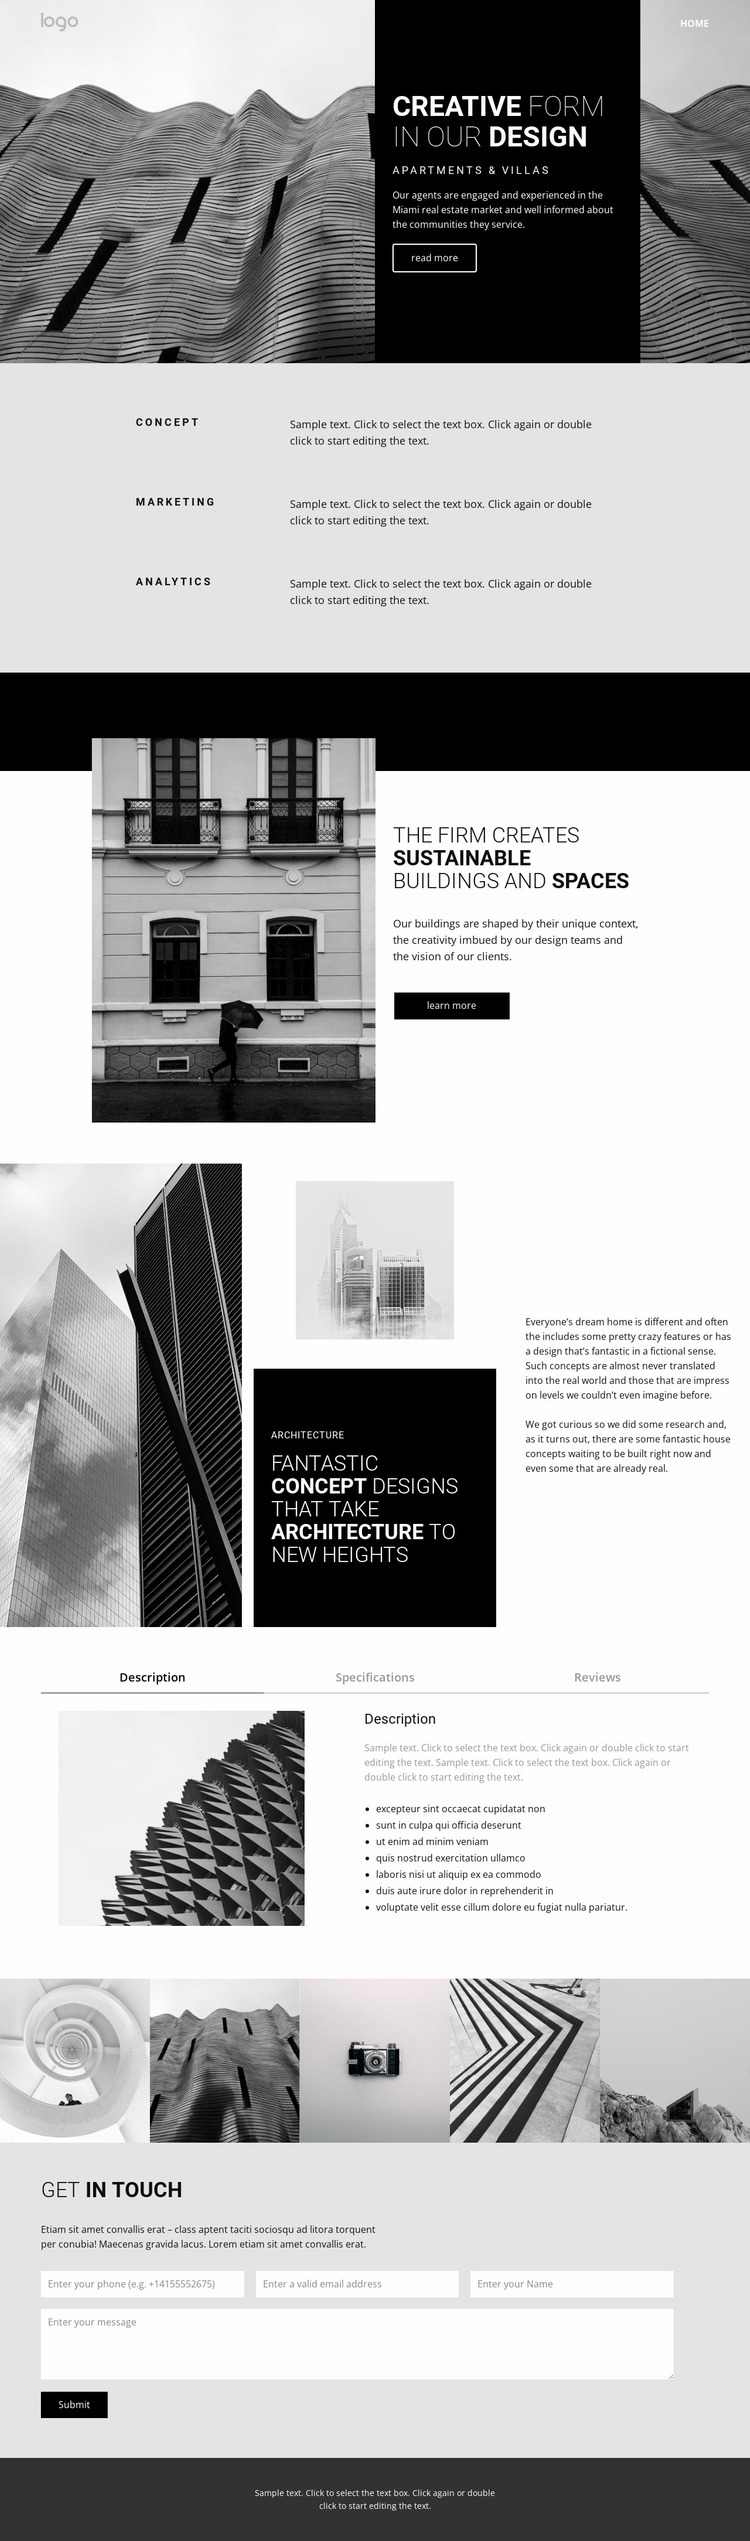 Creative concept architecture Website Mockup